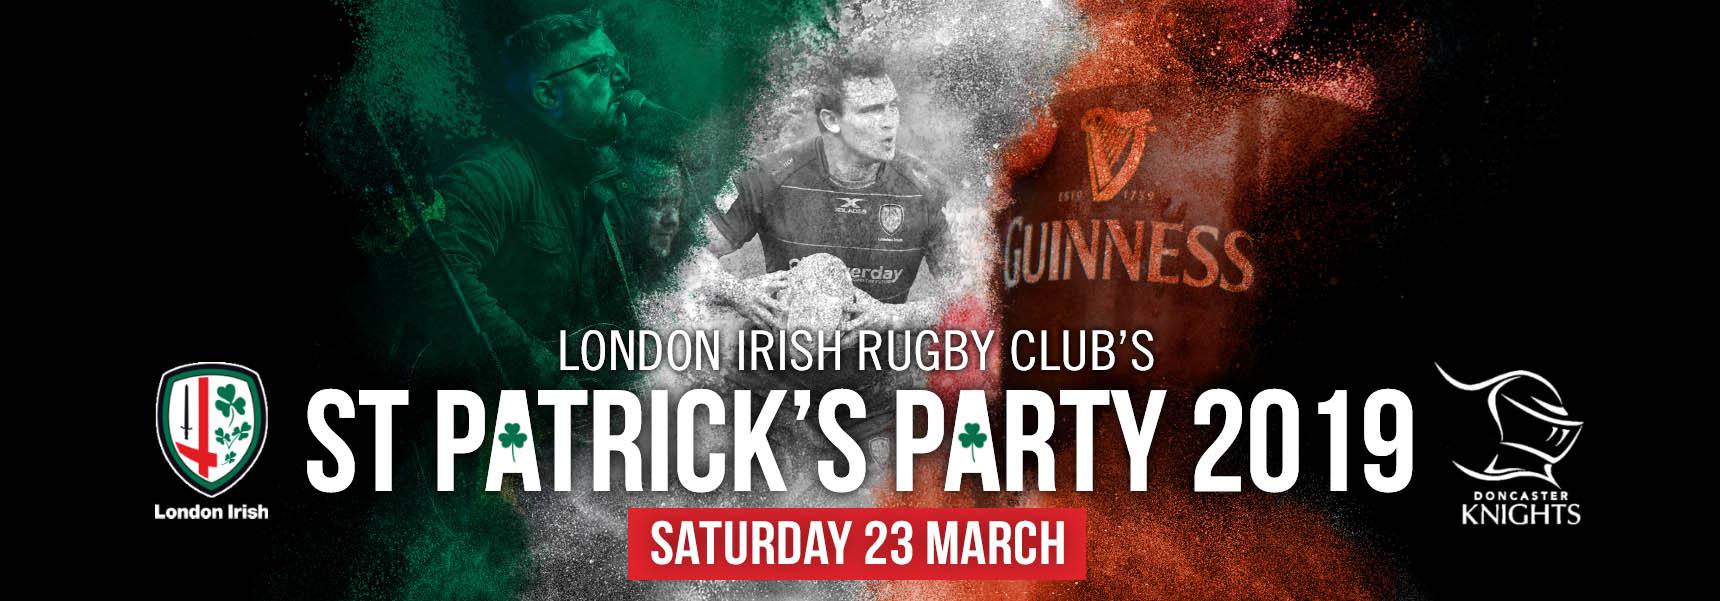 fefb28864d8 St Patrick's Party 2019. The famous London Irish ...